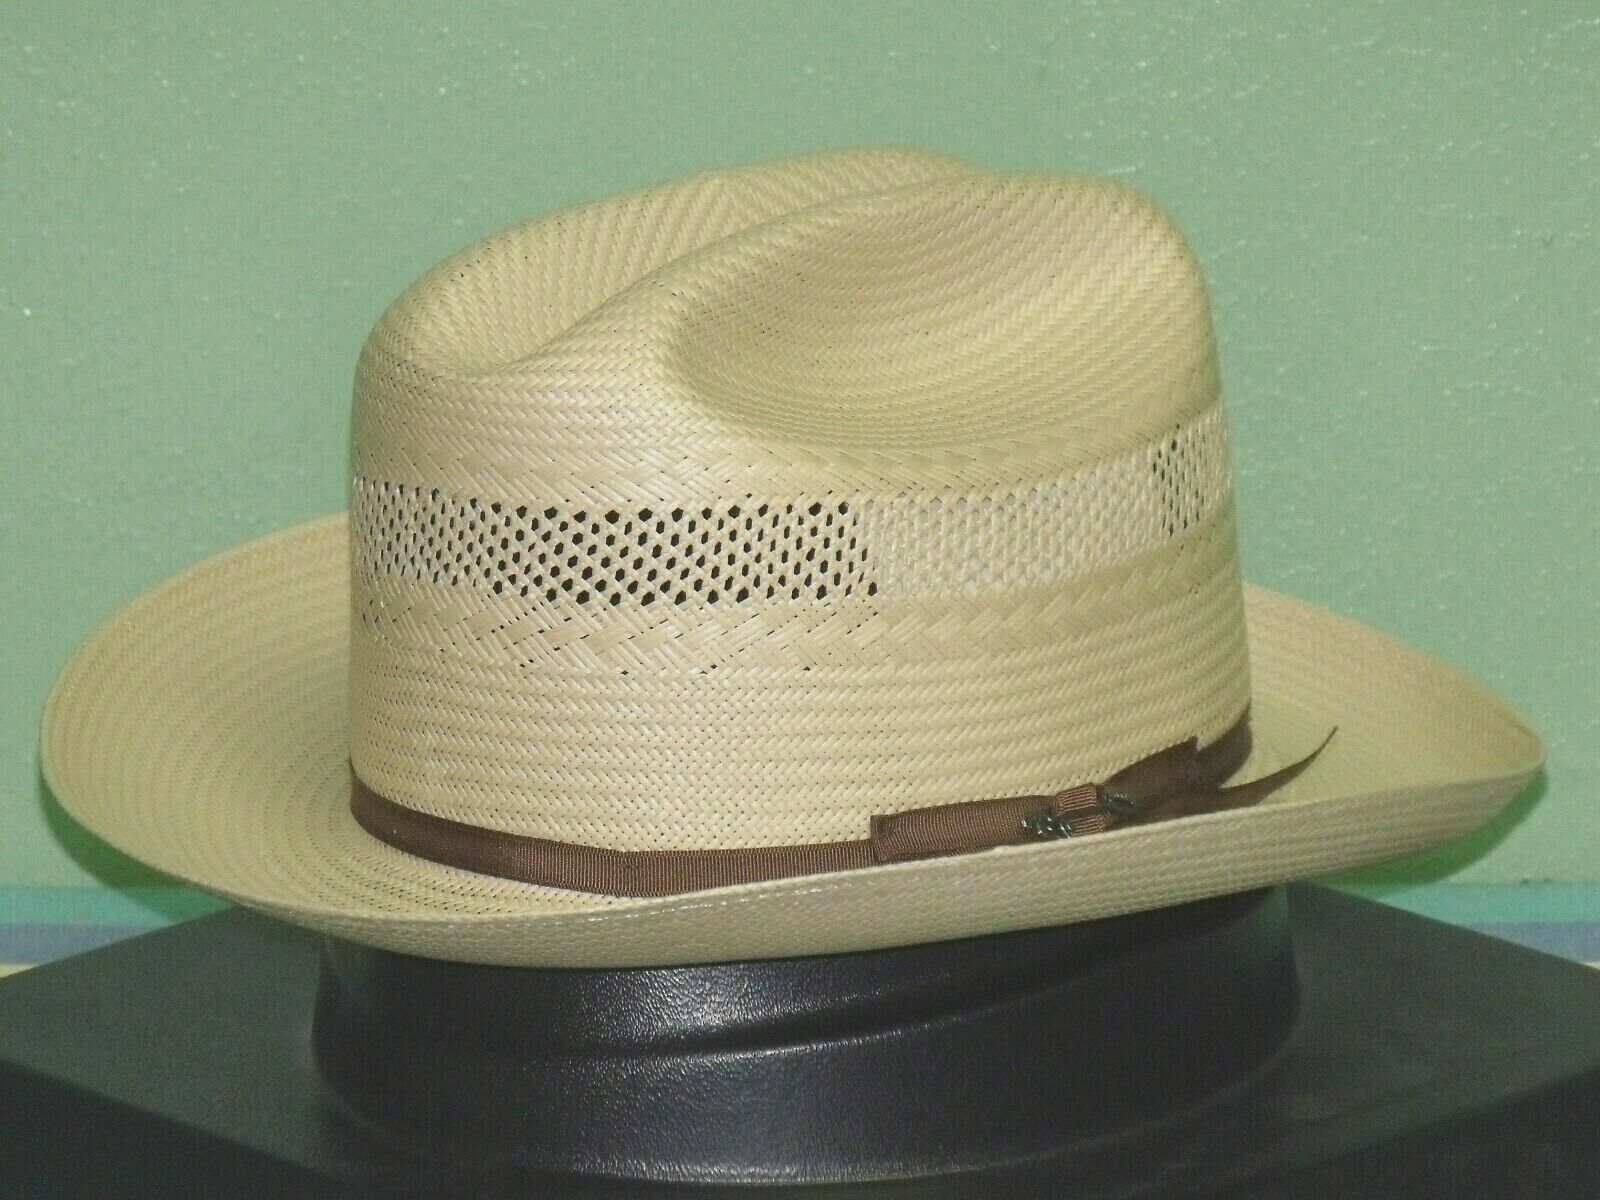 2e965c6e3 STETSON 10X SHANTUNG STRAW VENTED OPEN ROAD WESTERN HAT